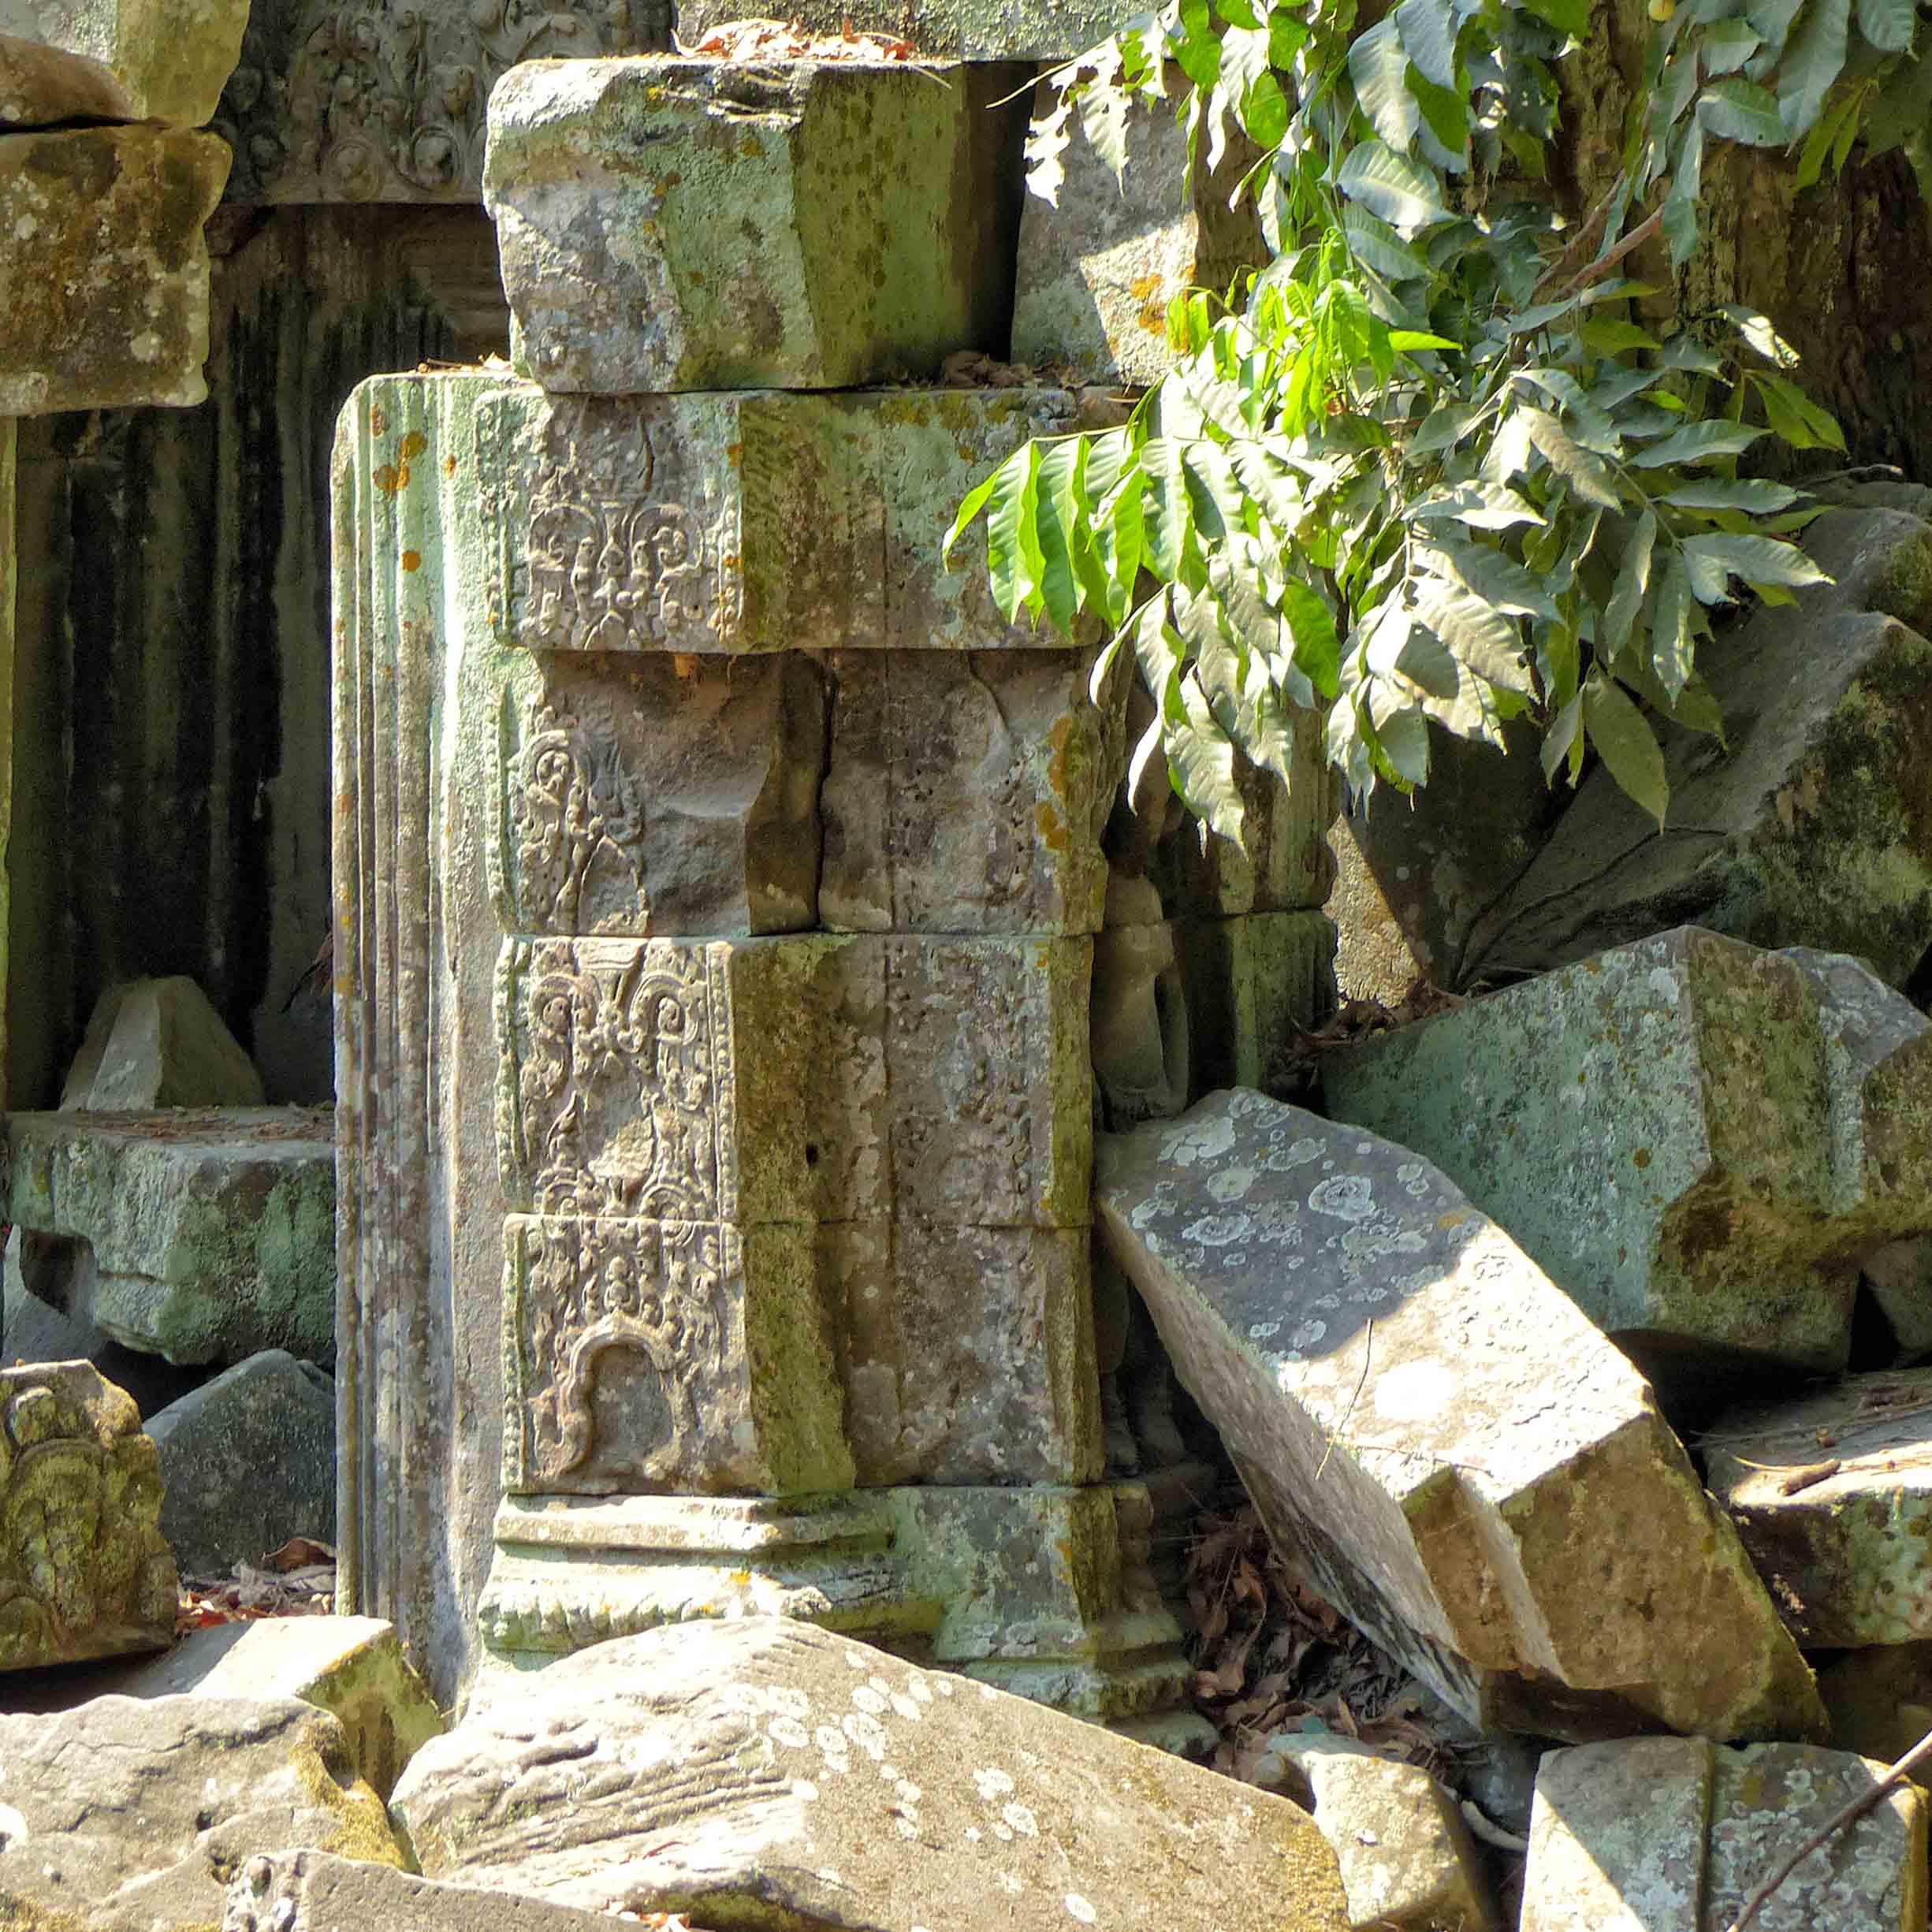 Tumbledown carved stone ruin